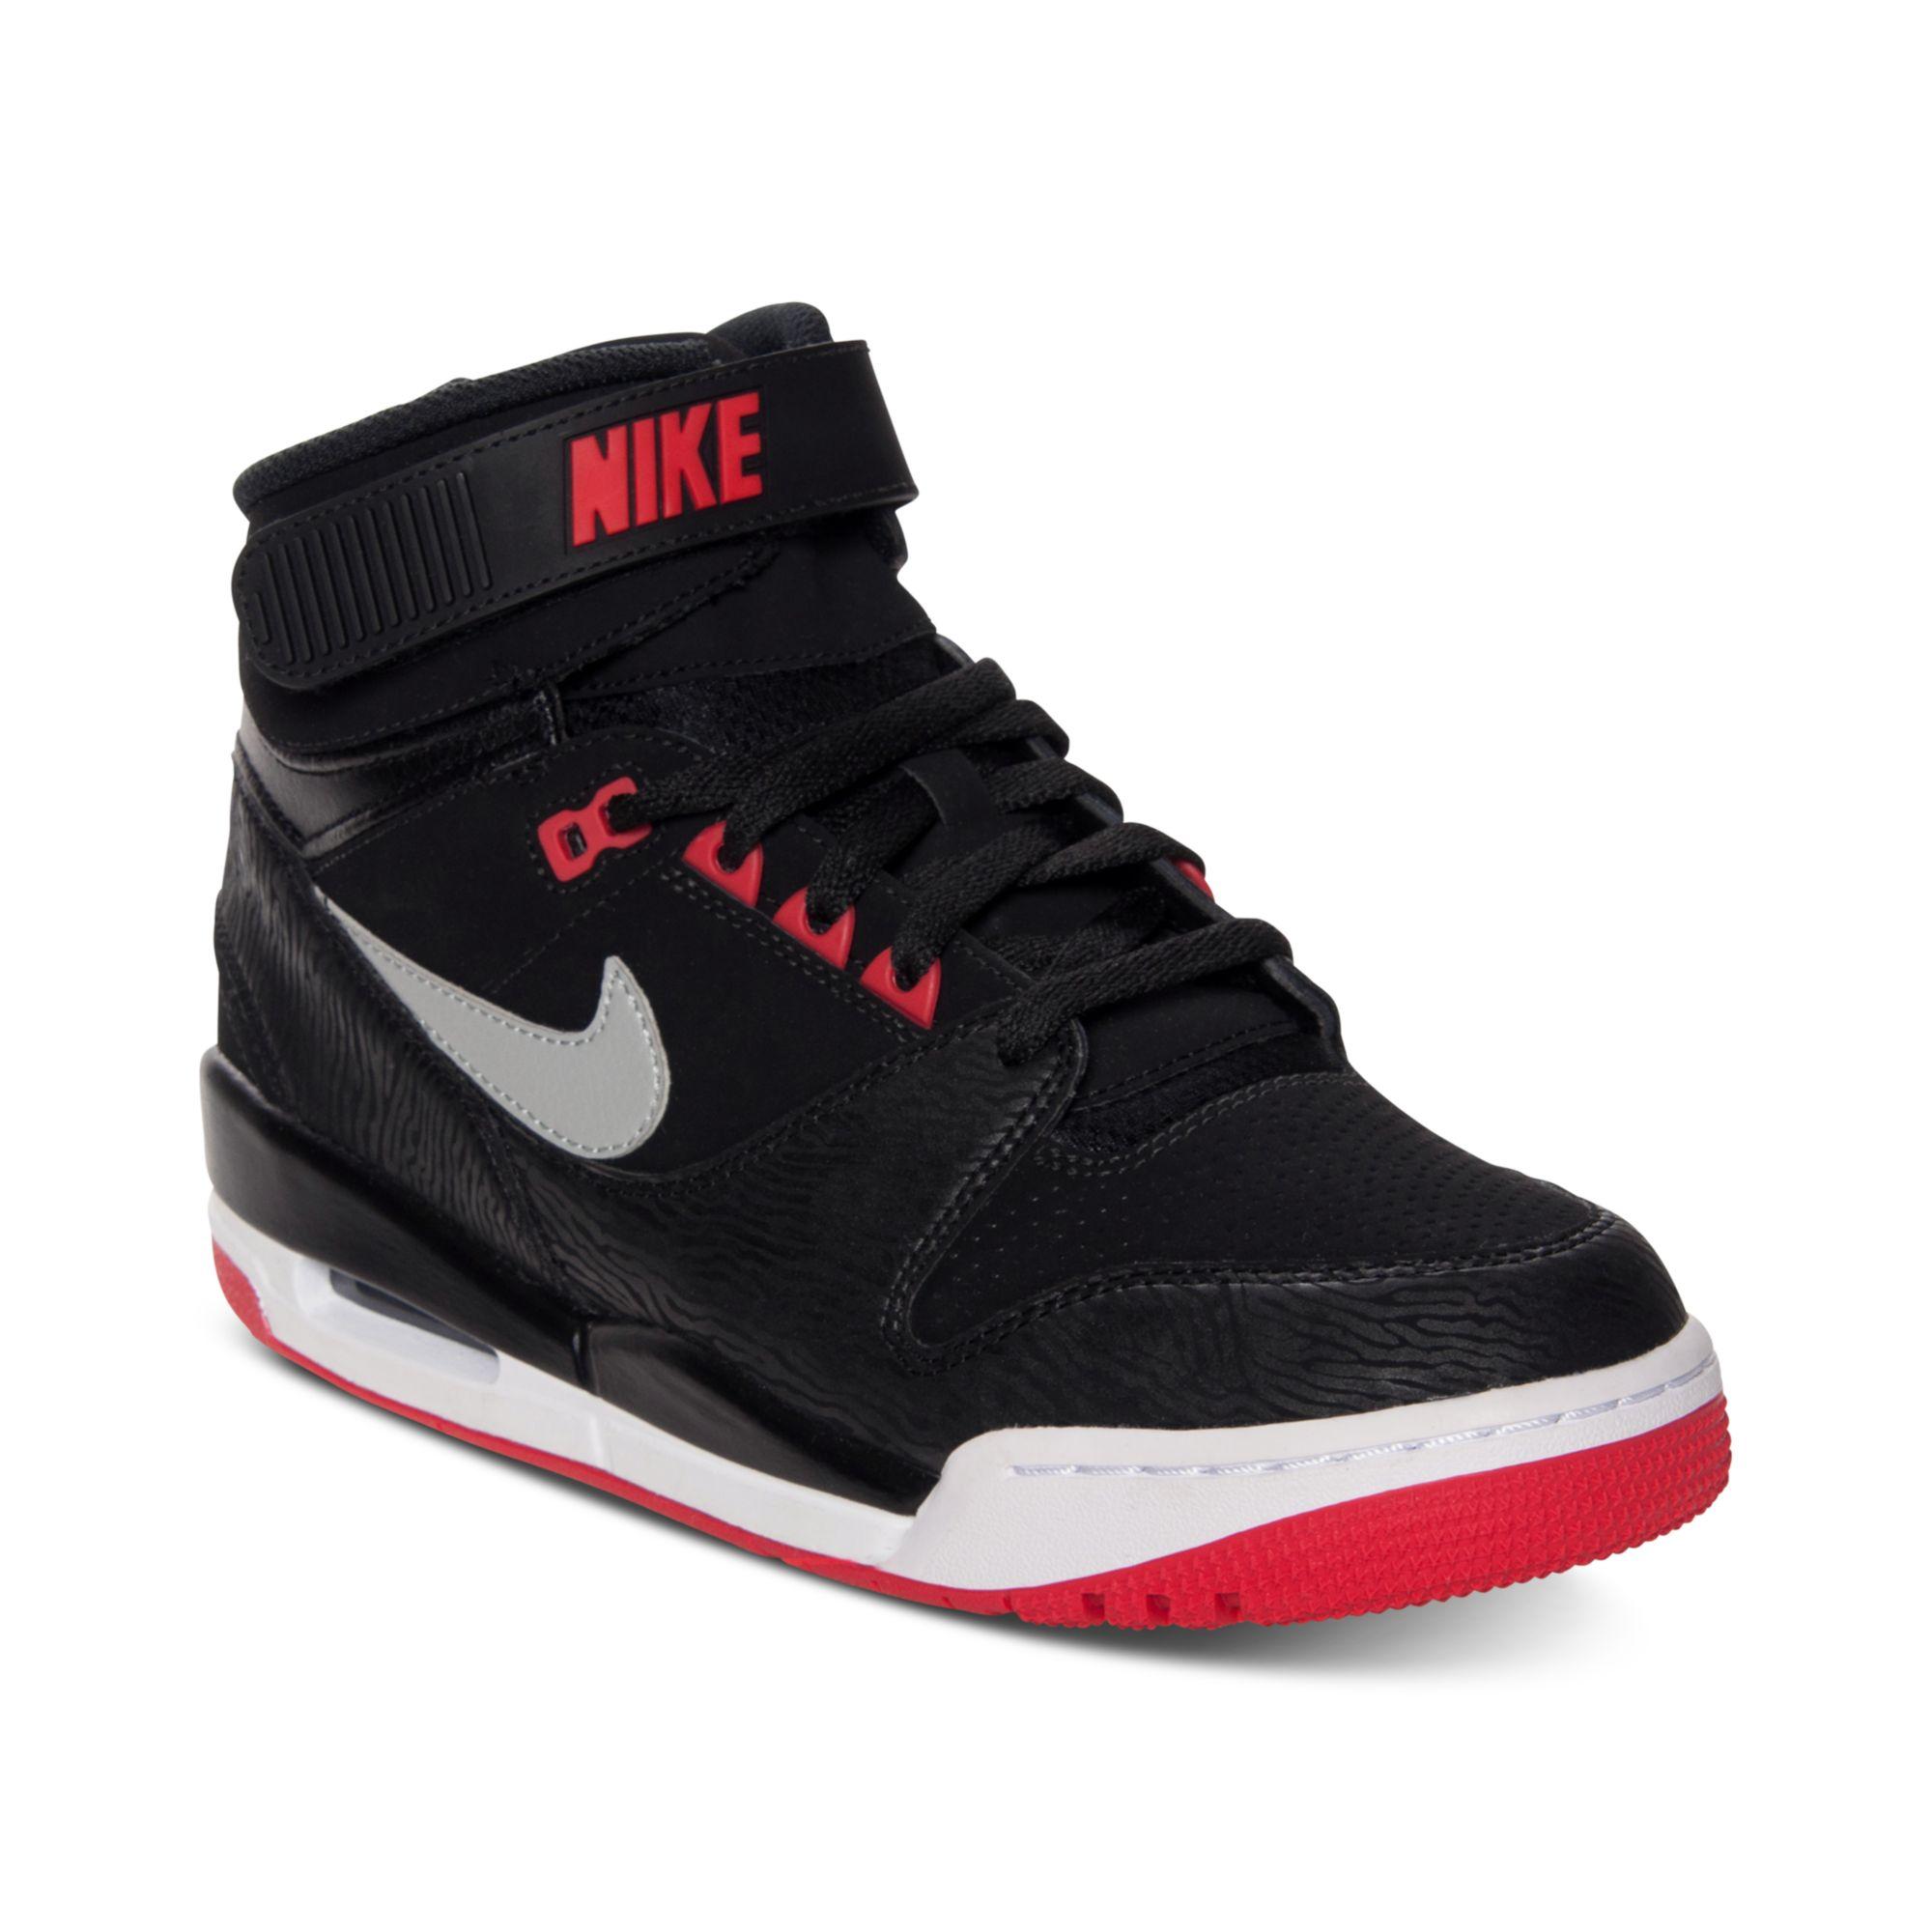 nike air revolution basketball sneakers in black for men. Black Bedroom Furniture Sets. Home Design Ideas